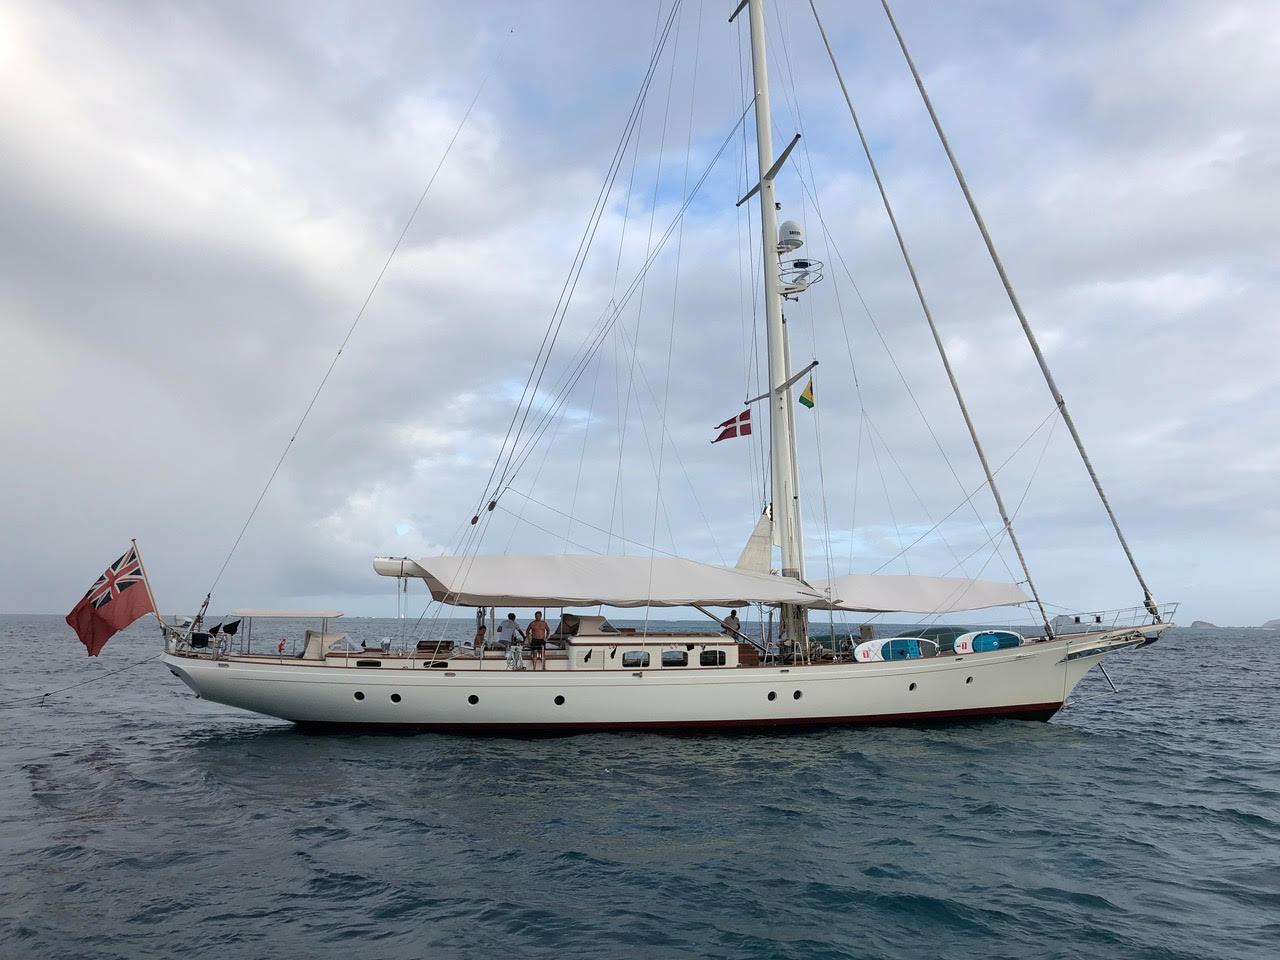 "FOFTEIN 30.21 M / 99'01"" sailing yacht of German Frers design from Royal Huisman Shipyard."